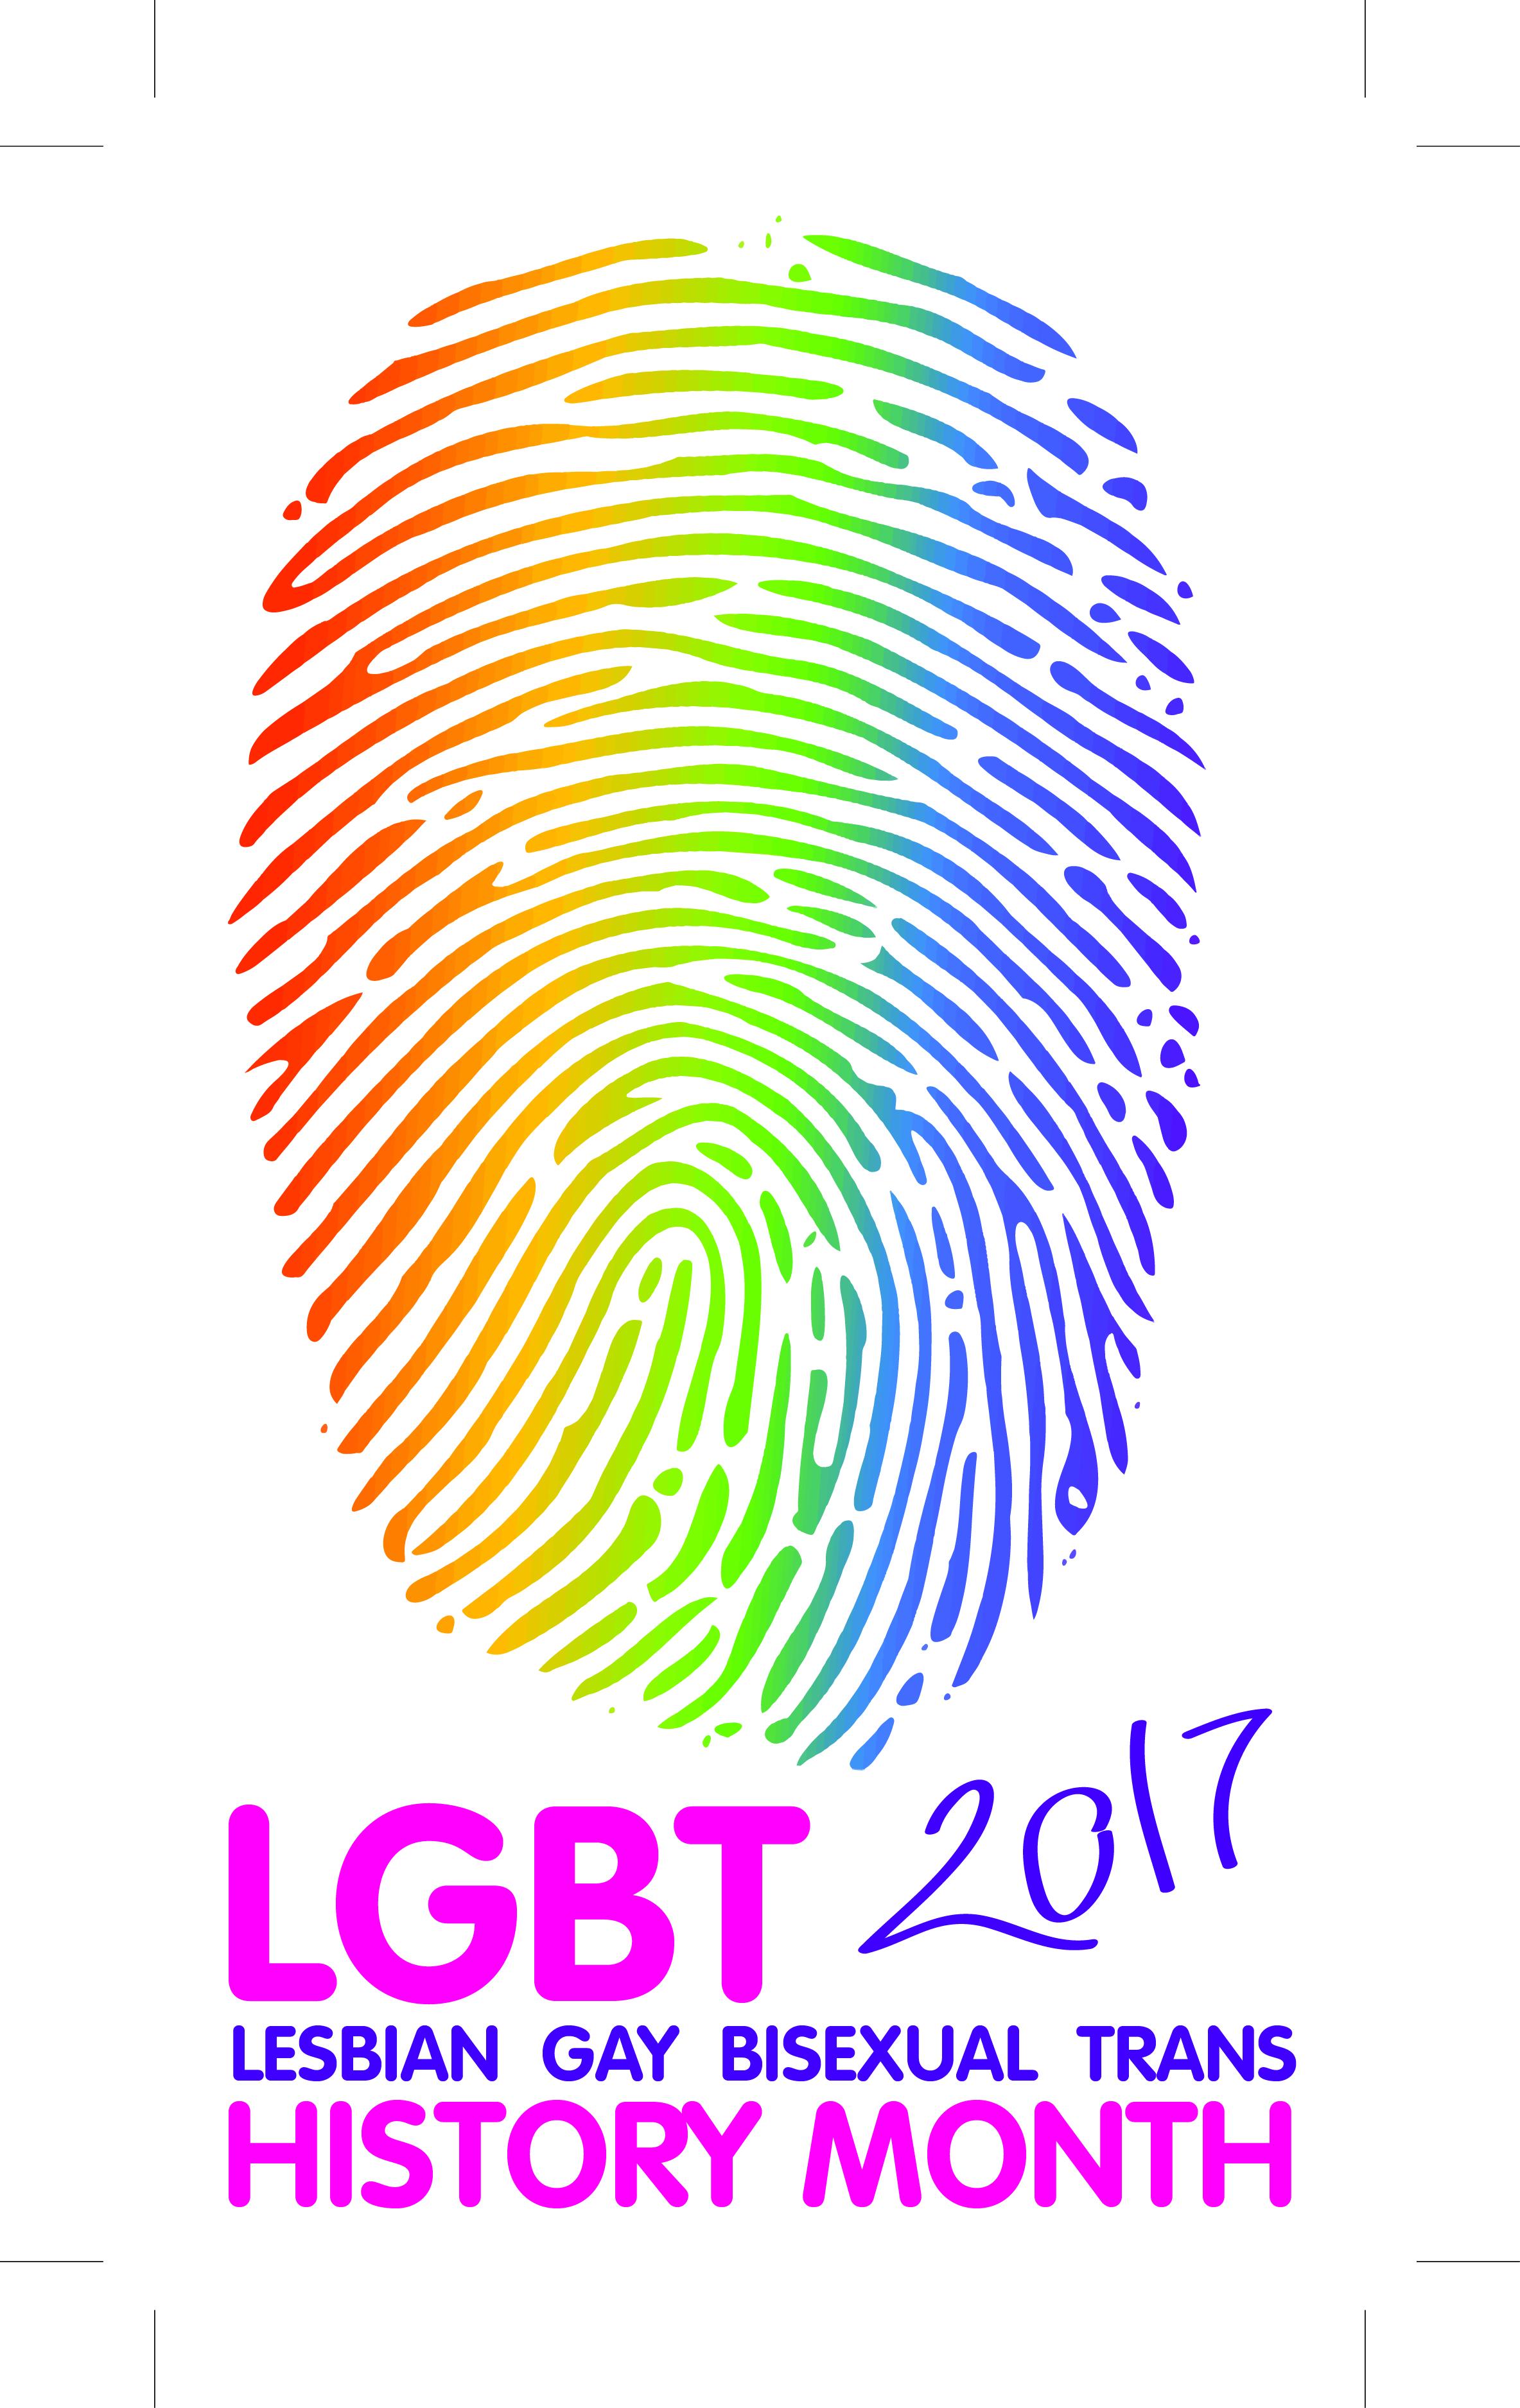 2017 LGBT HIGH RES